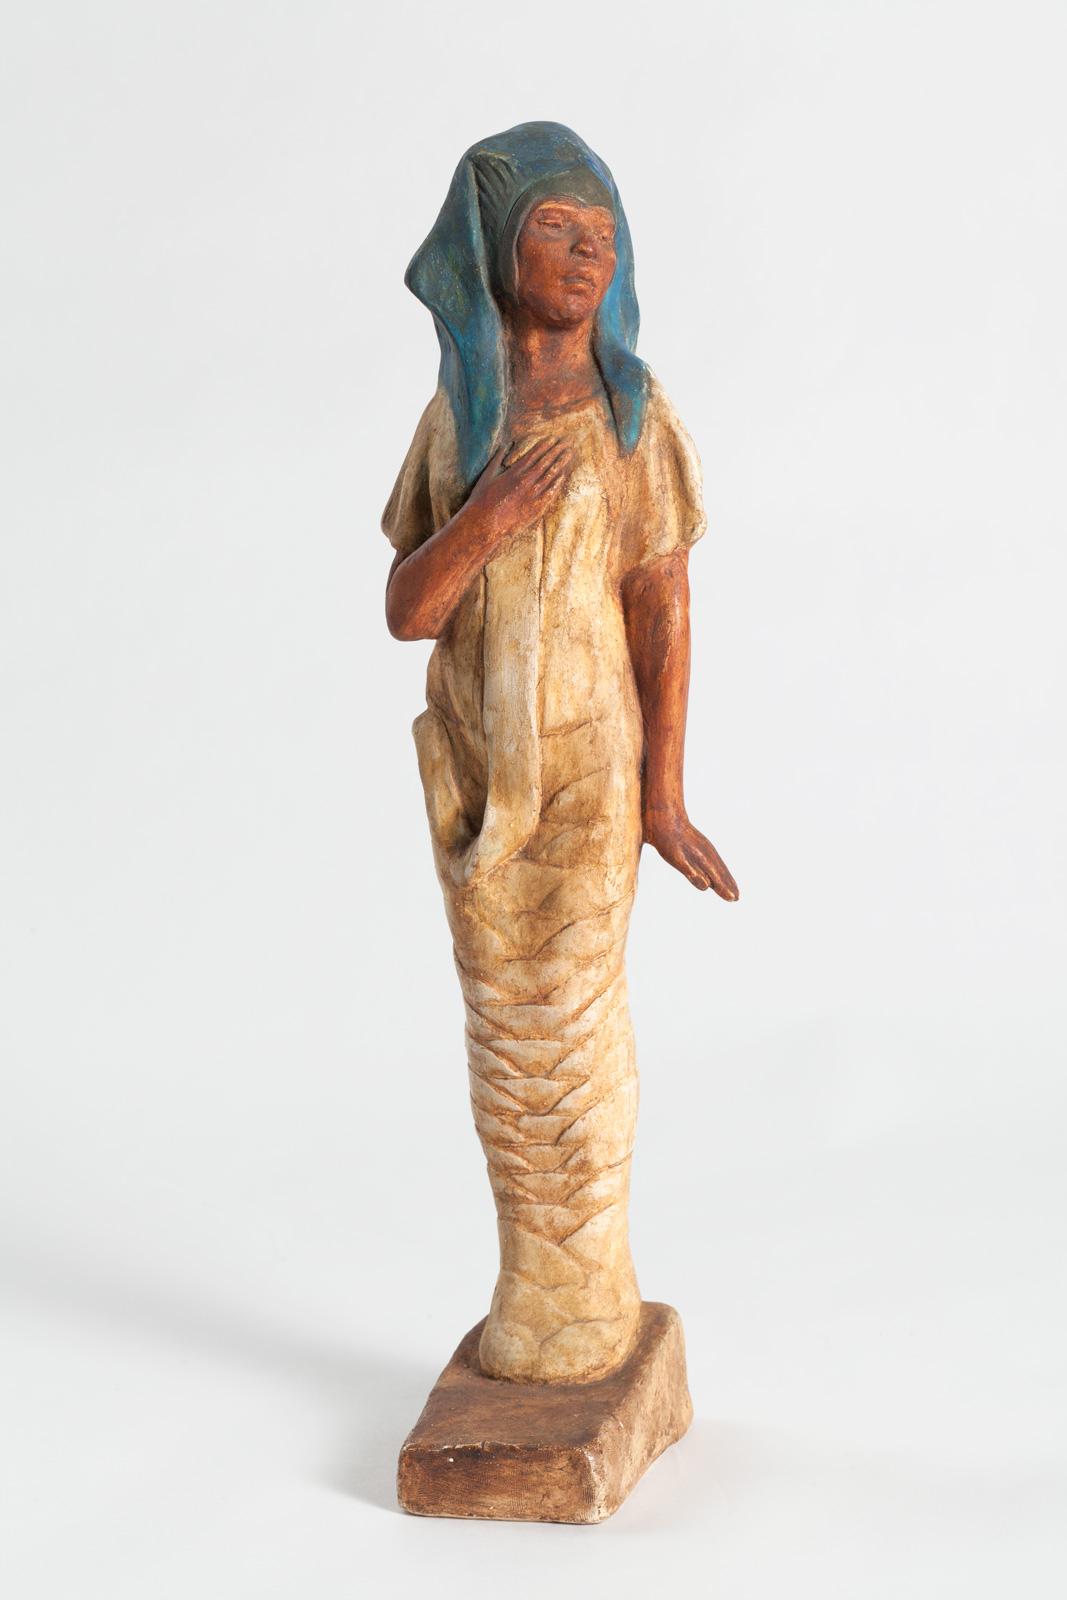 Sculpture / statue of a woman